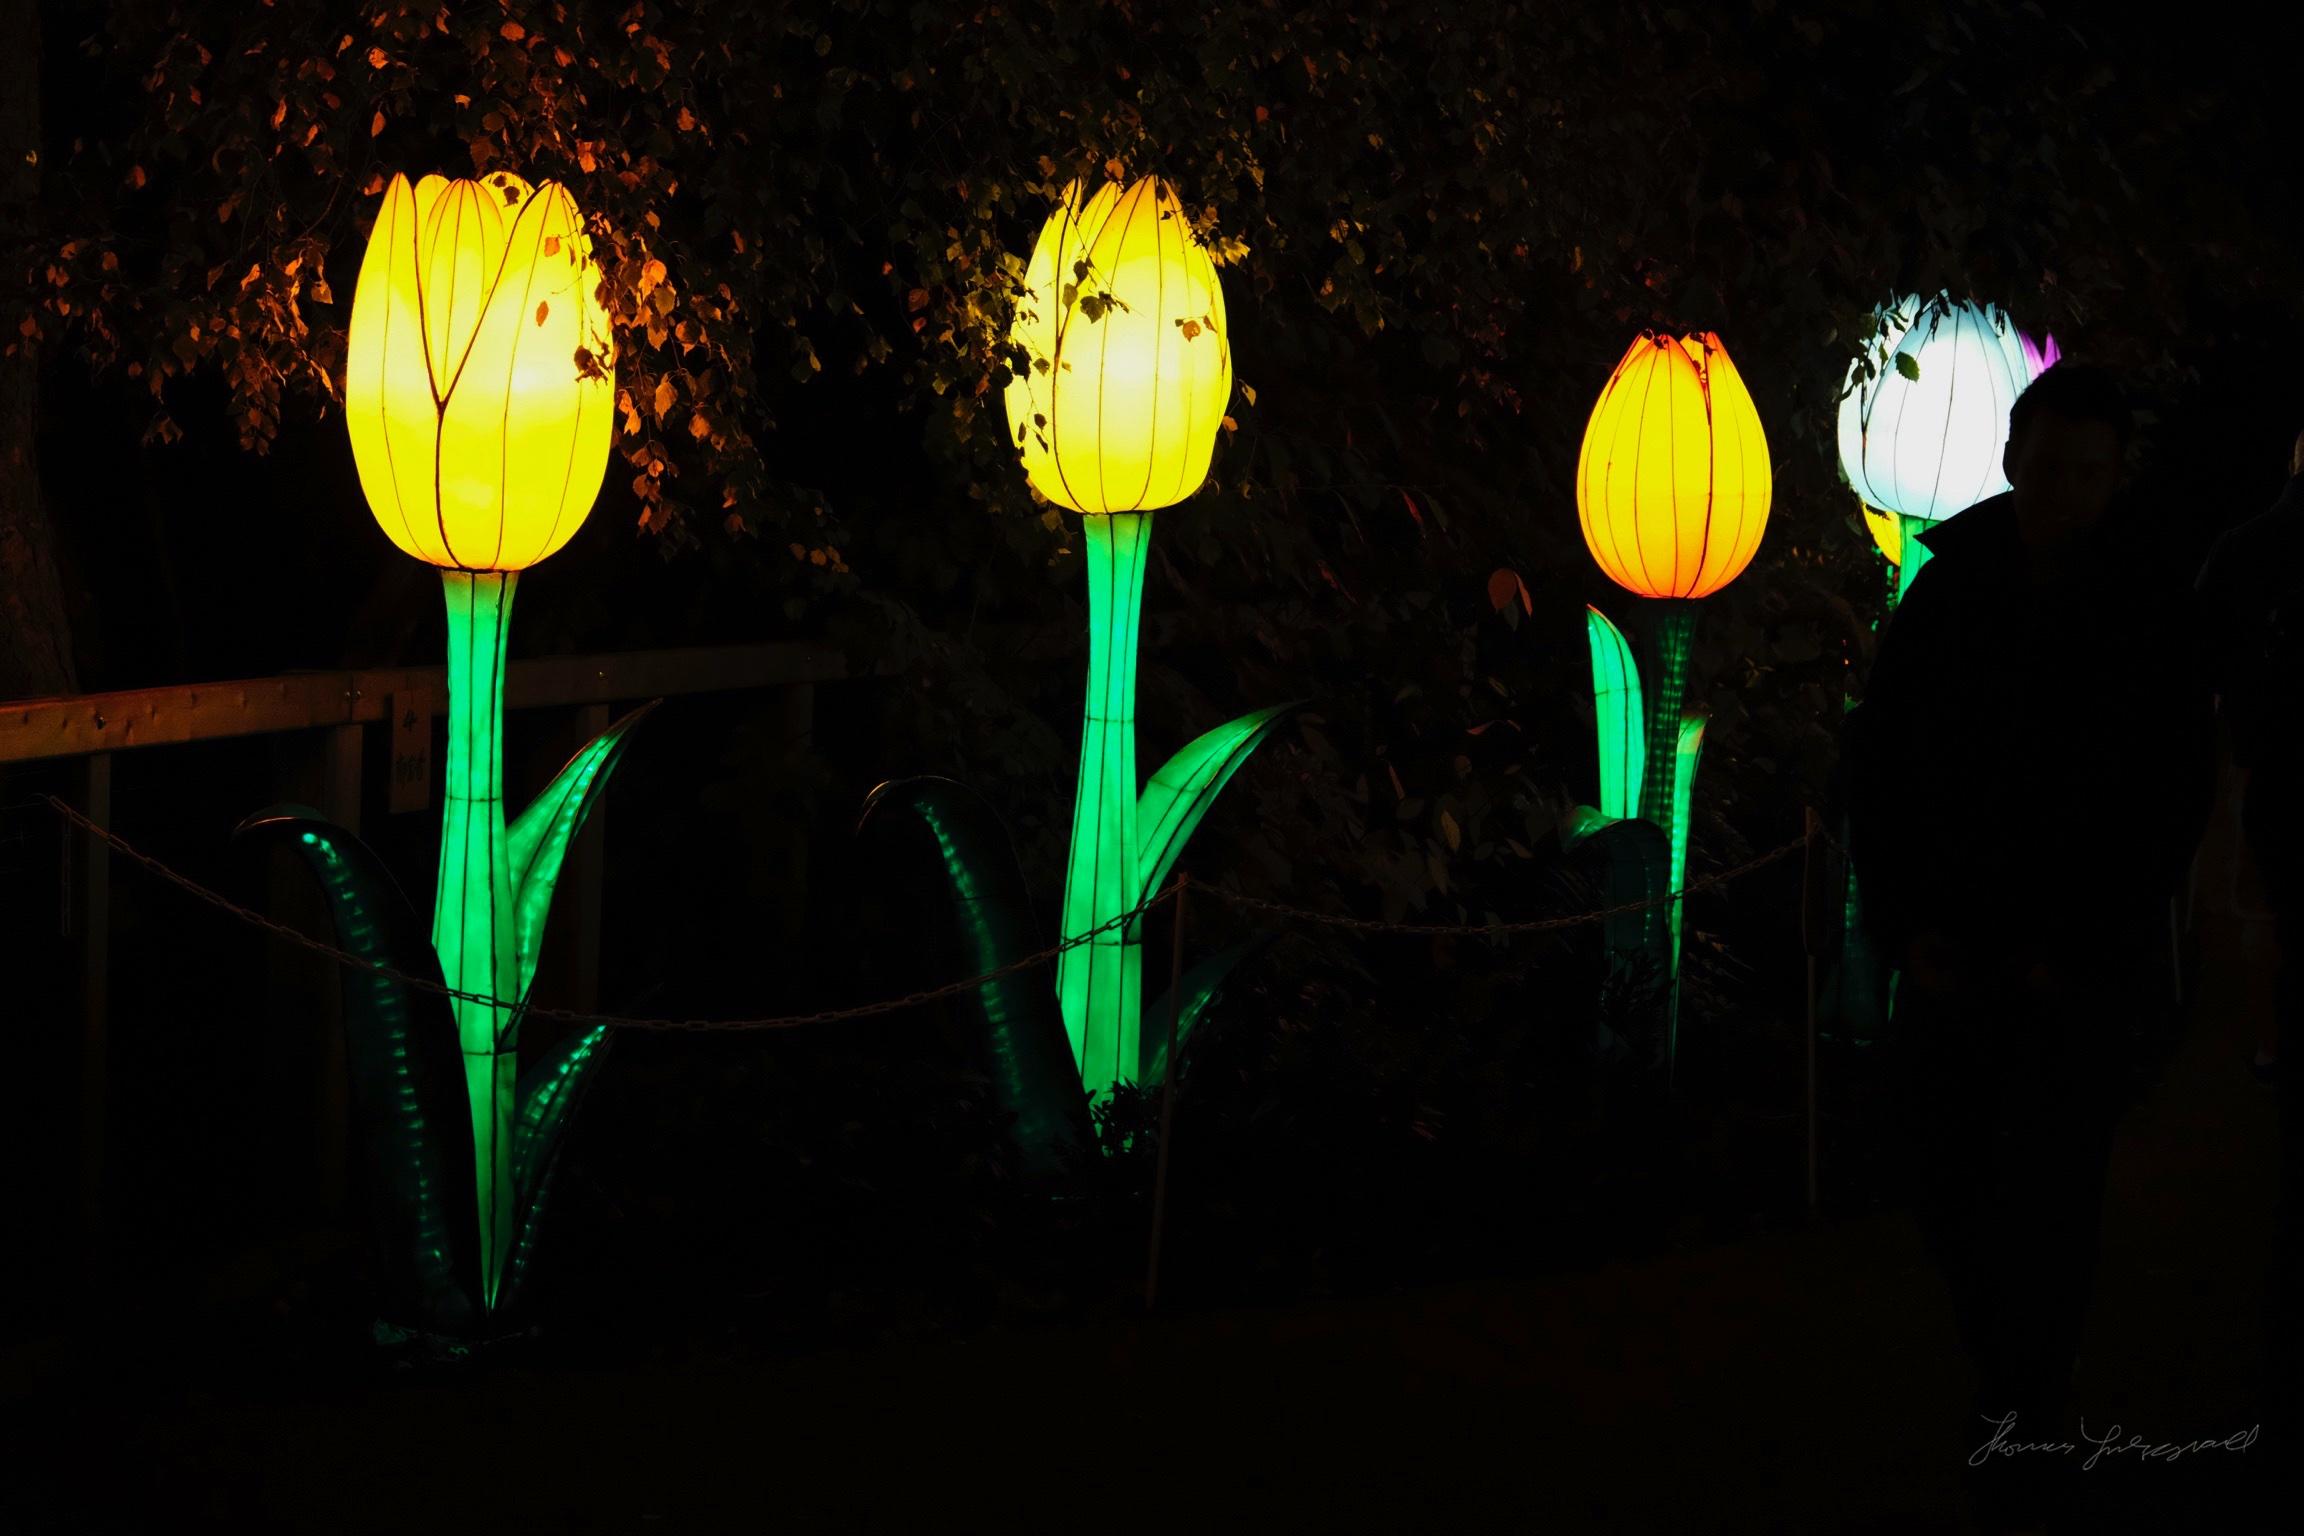 Wild-Lights-Dublin-Zoo-079.jpg